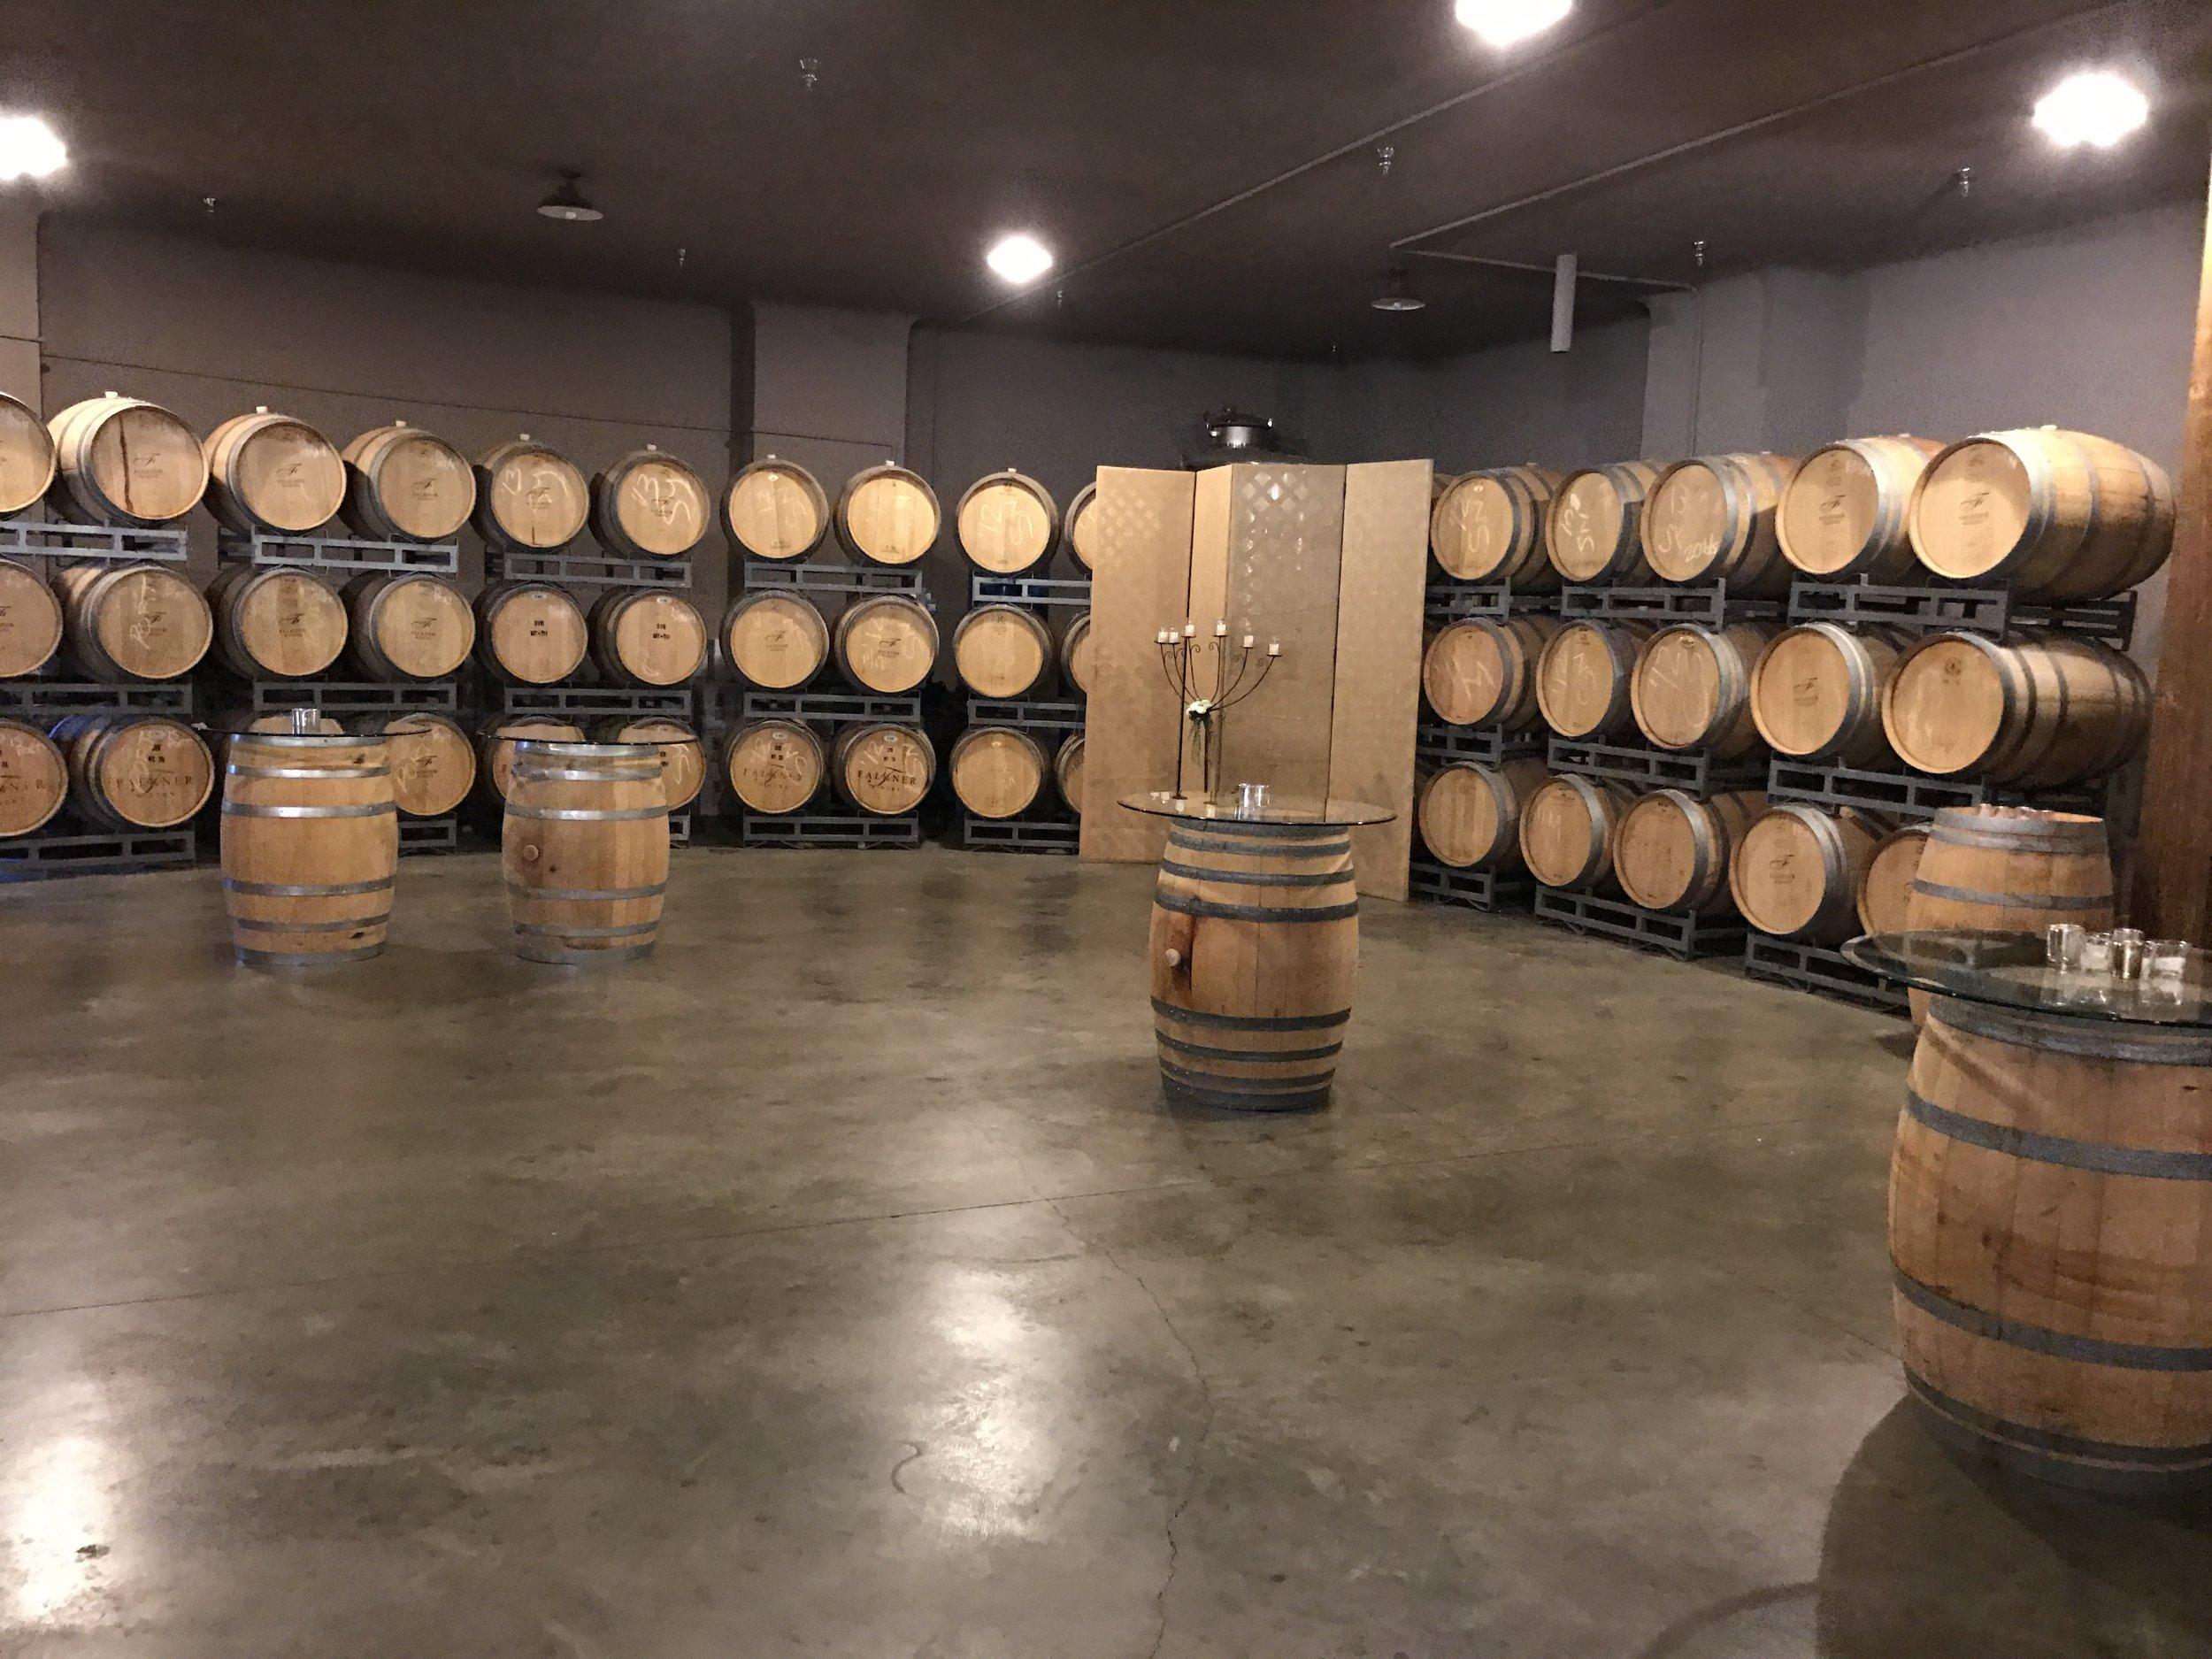 Wine tasting in Temecula, CA - Falkner Winery